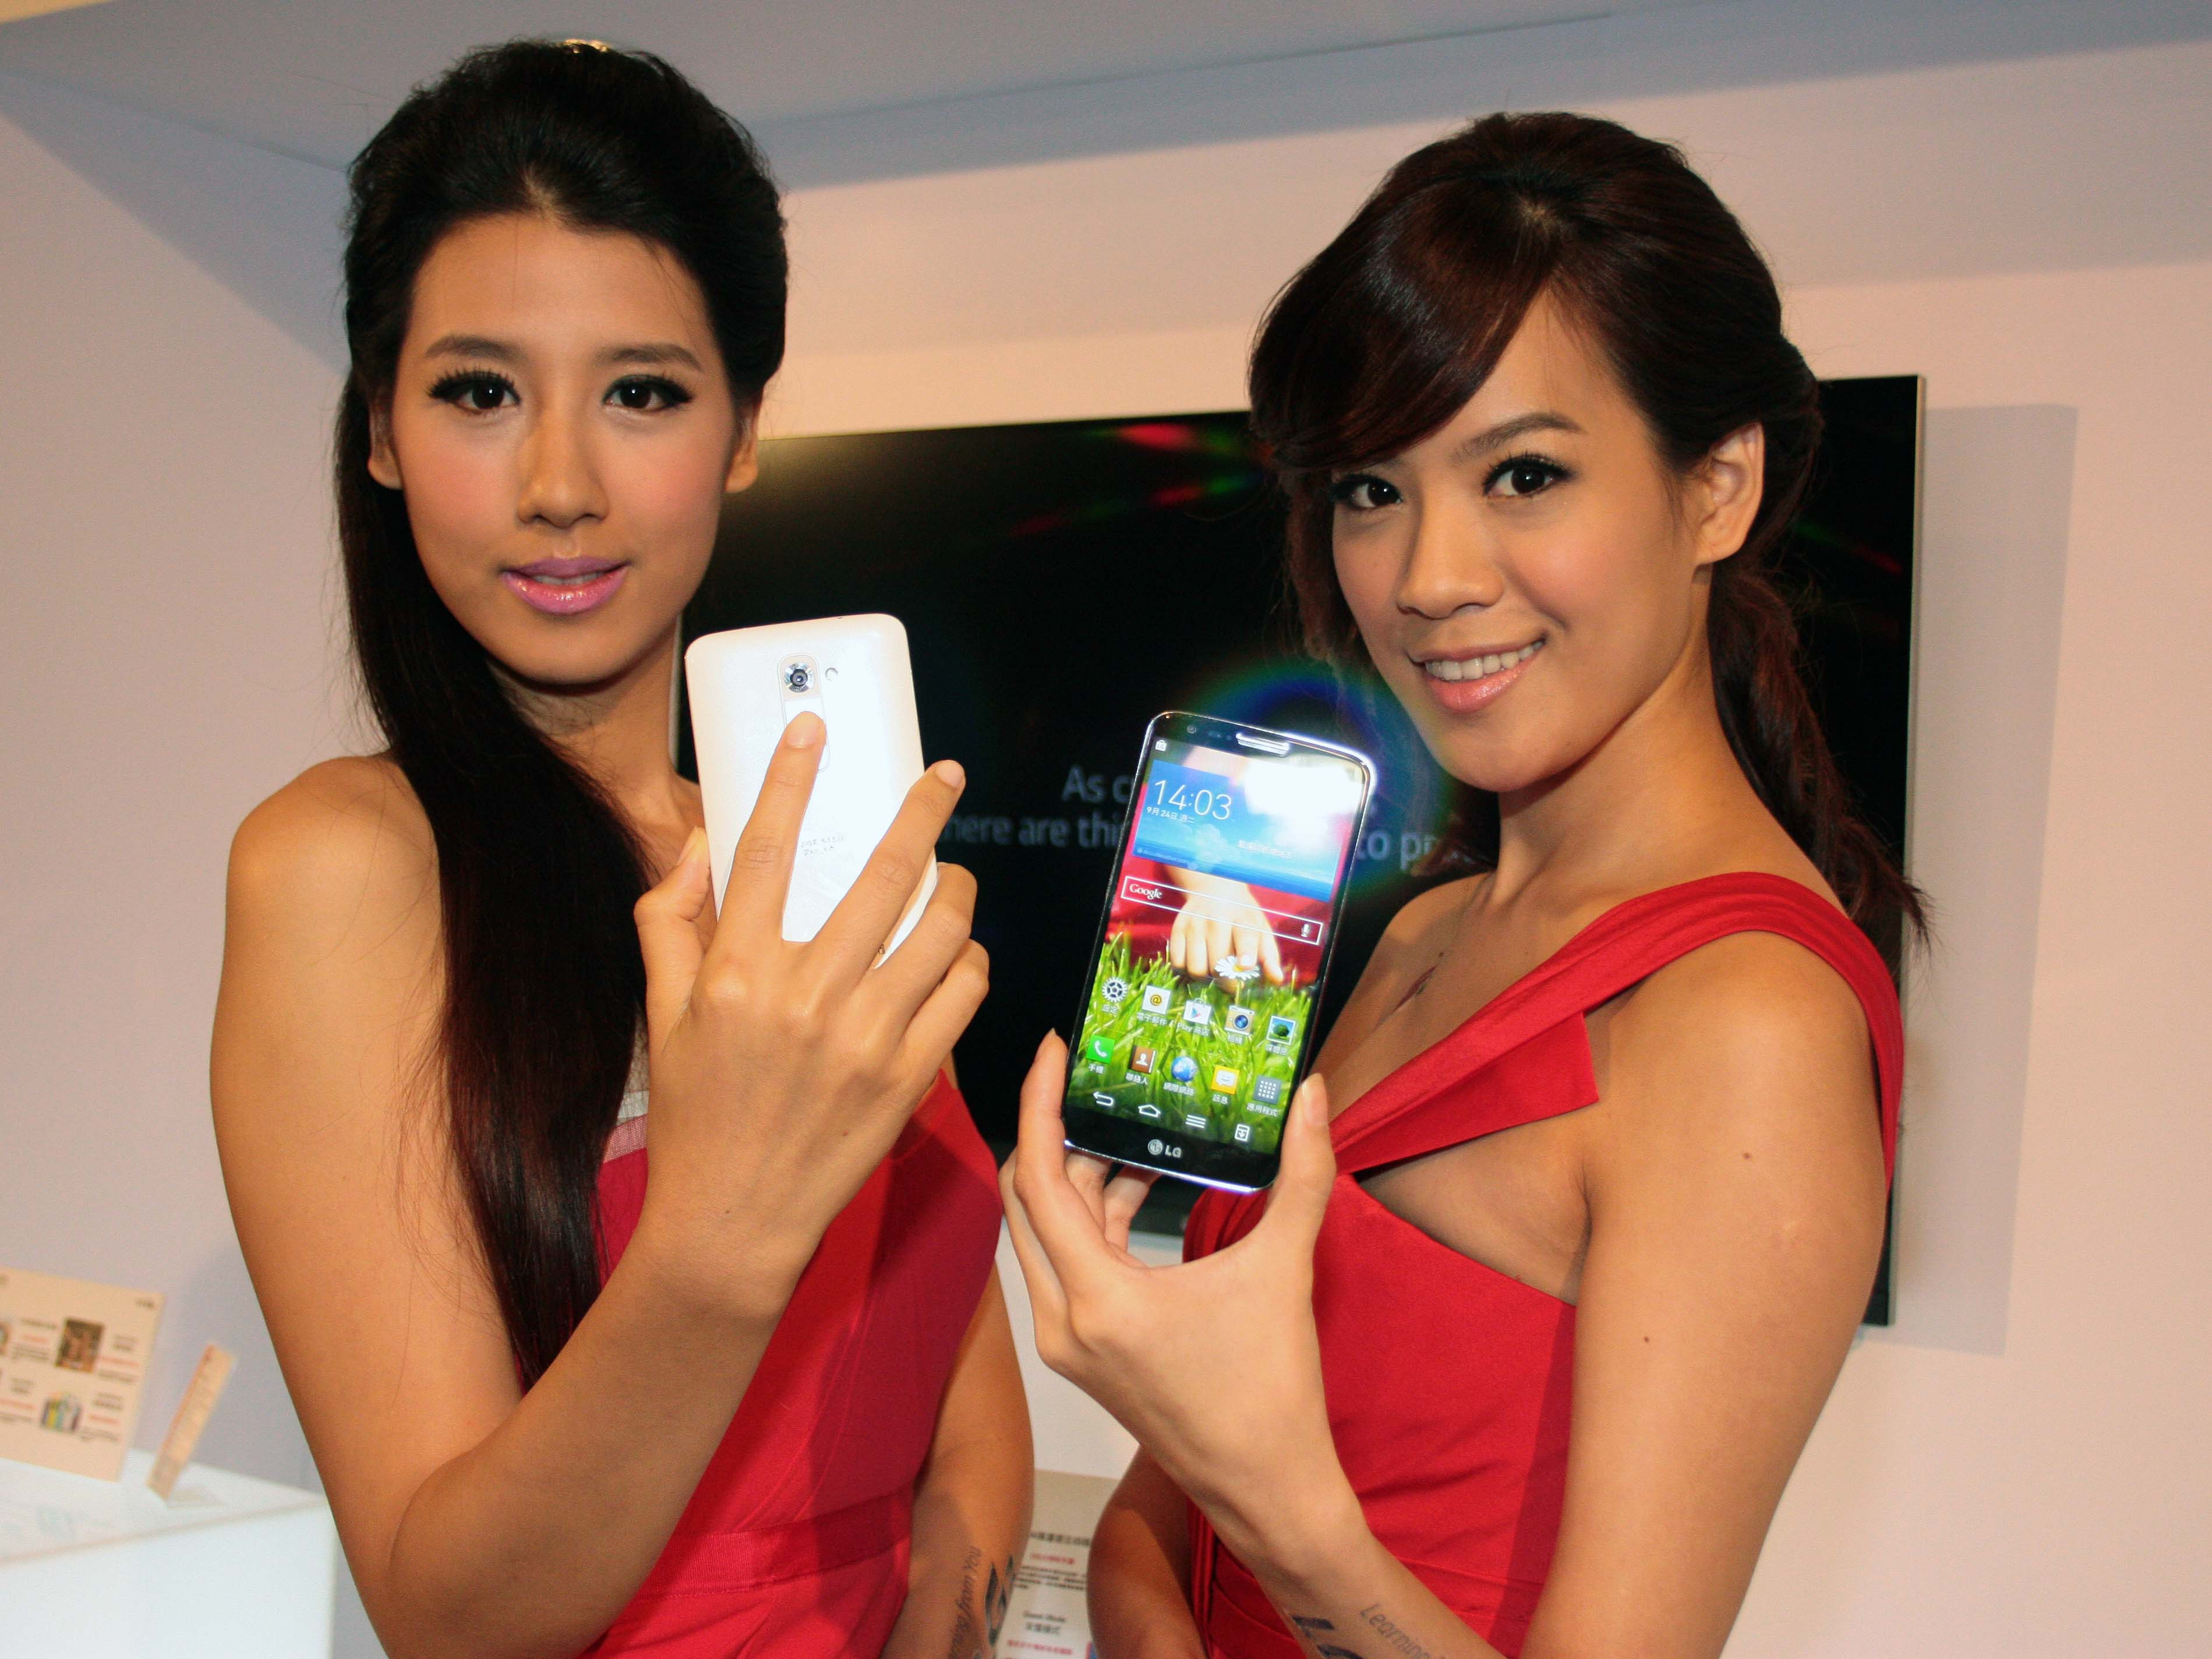 LG G2 正式發表 16GB 版本售價19,900元 10月底前送QuickWindows感應皮套